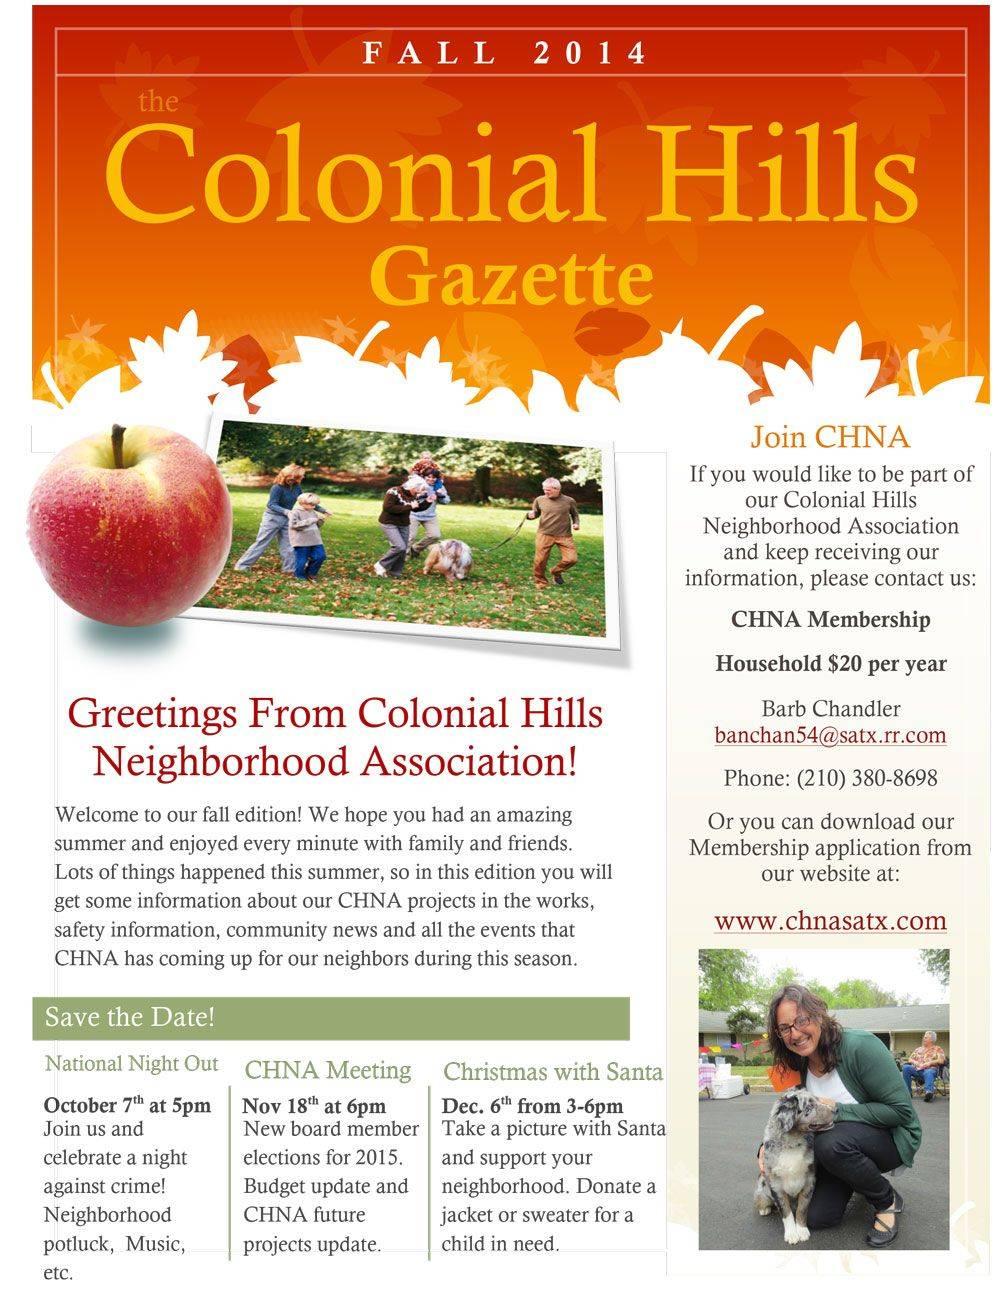 Neighborhood Newsletter Template